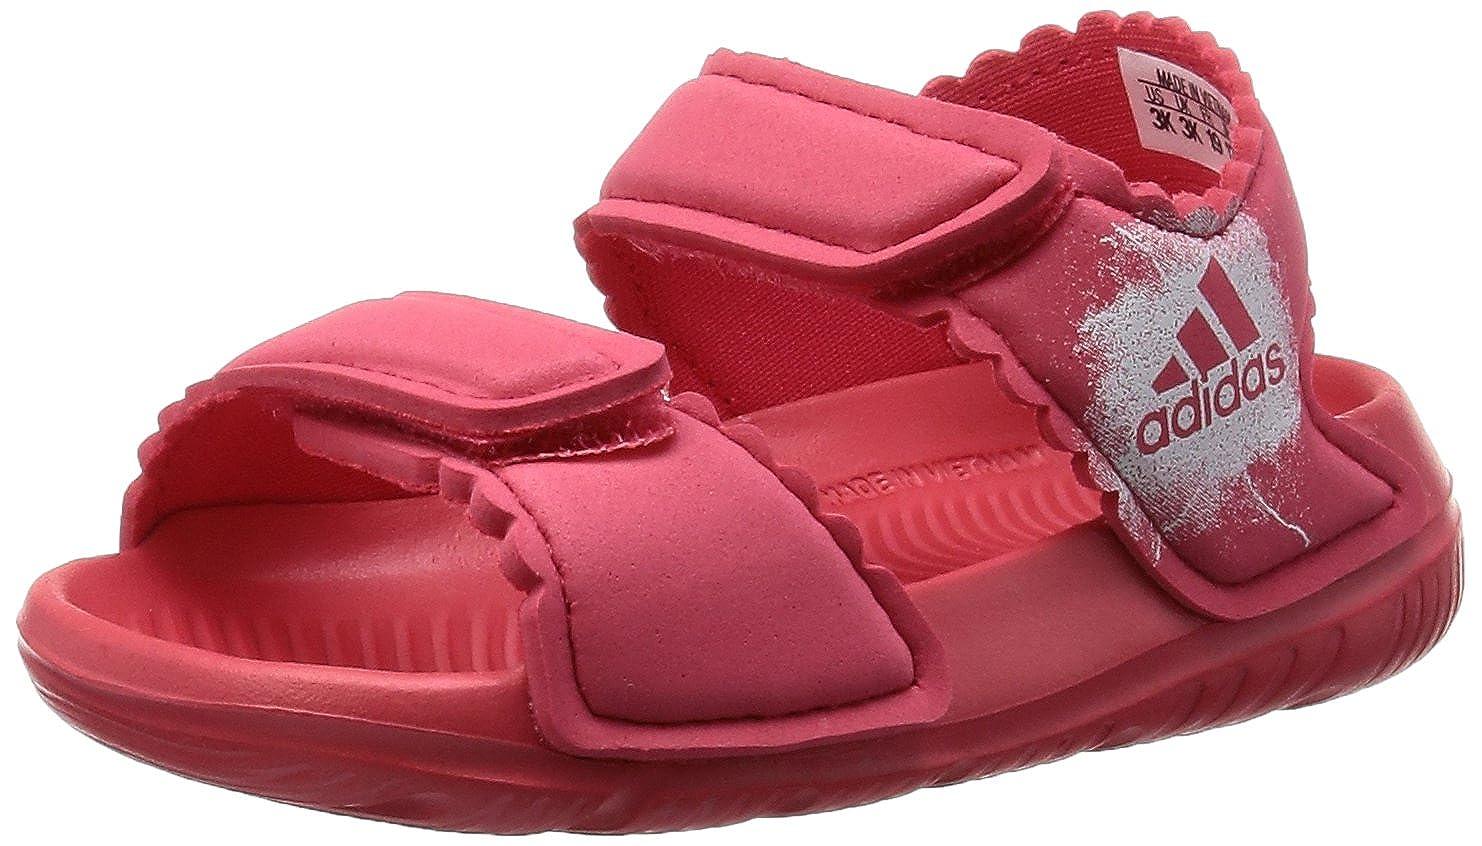 Adidas Altaswim G I, Chaussures de Fitness Mixte Enfant BA7868